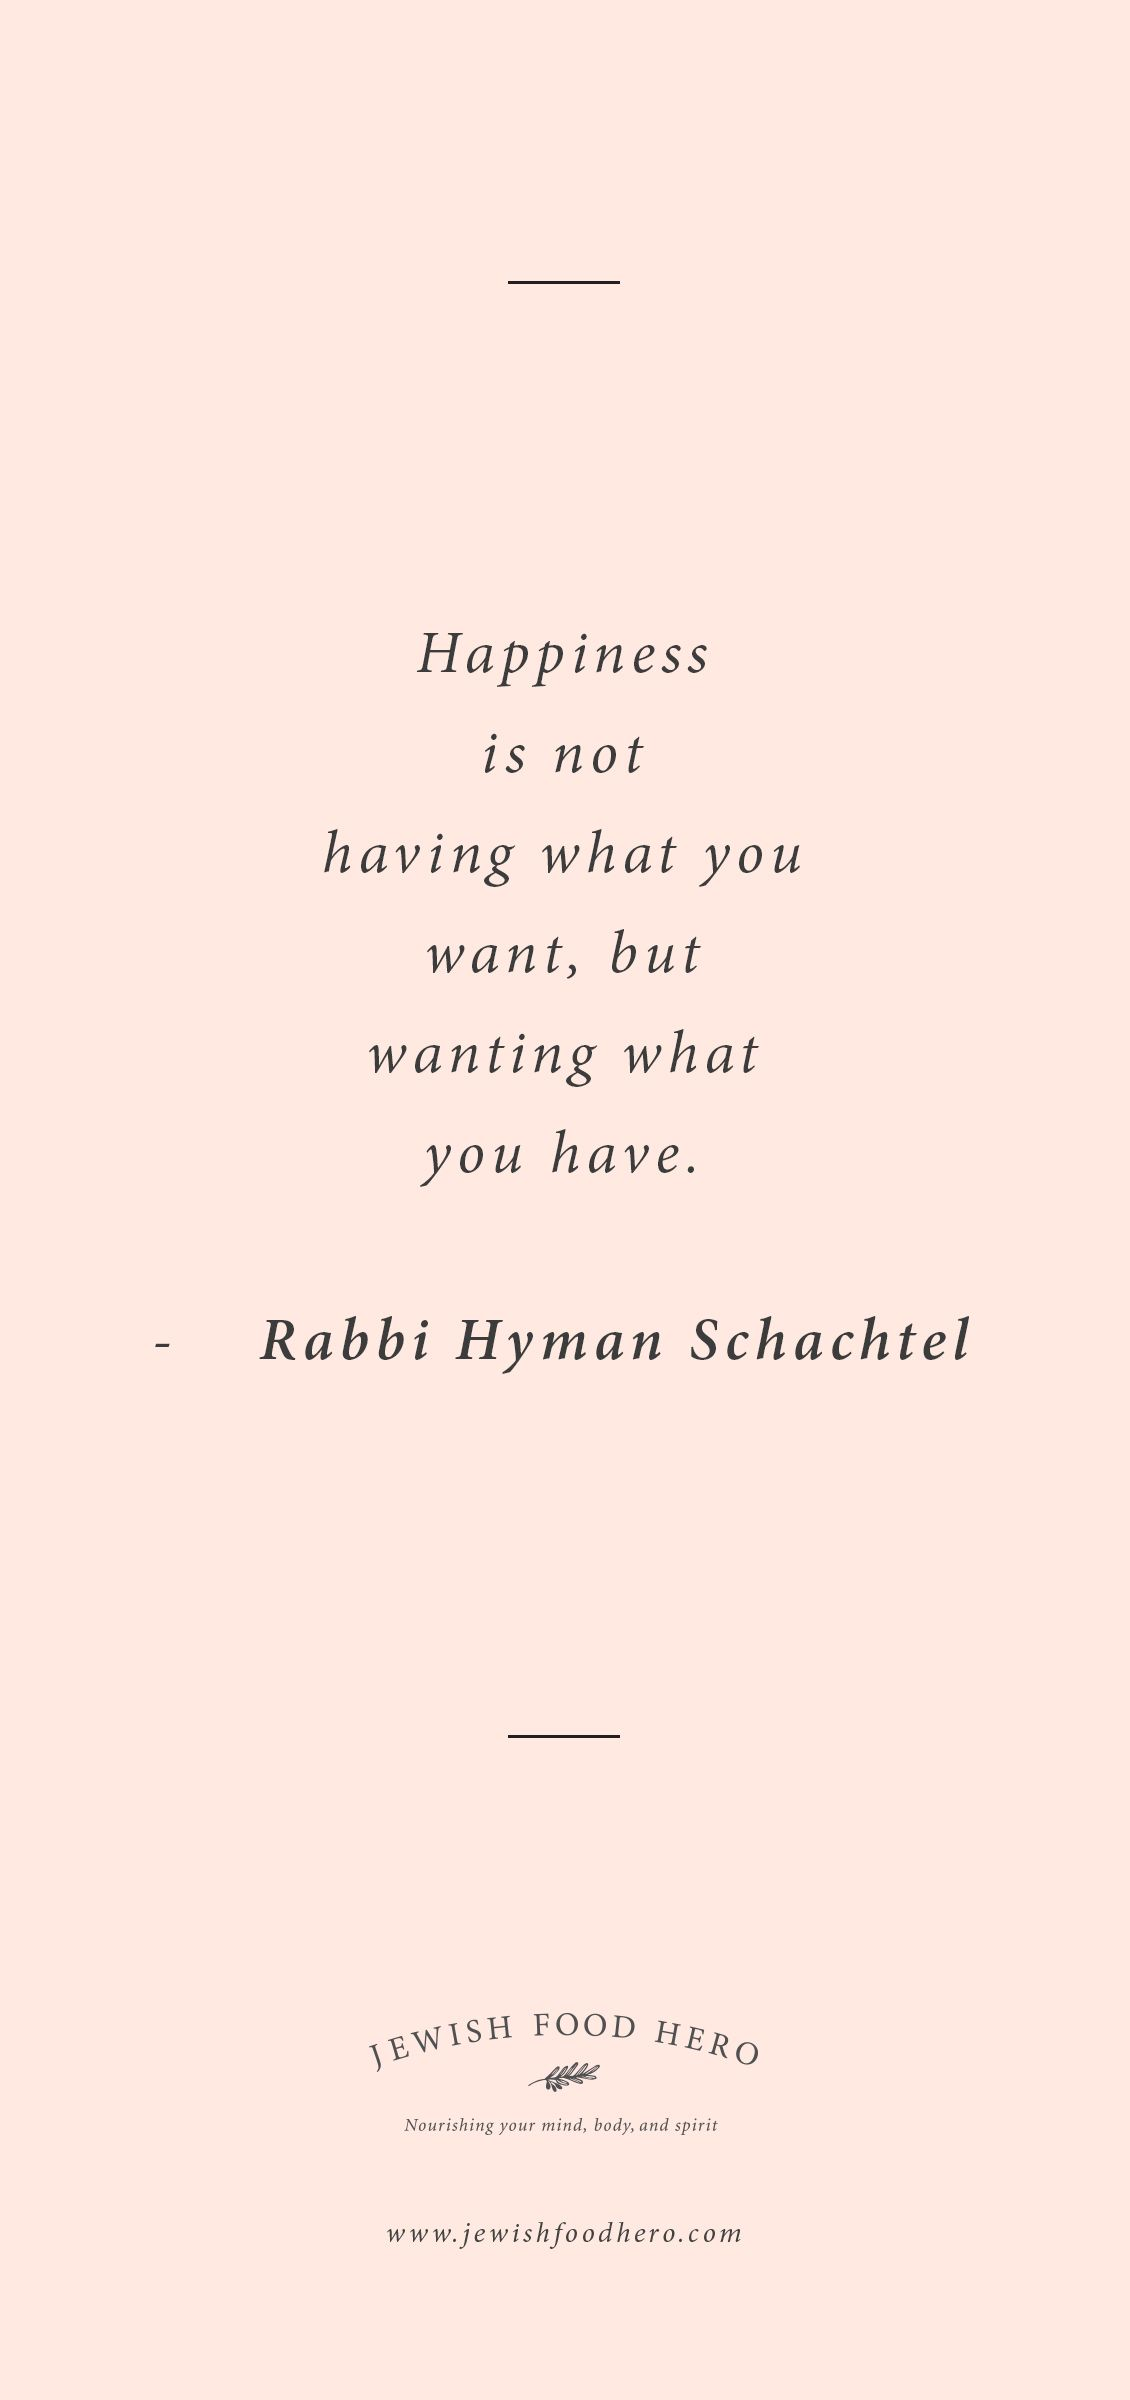 Rabbi Hyman Schachtel Quotation